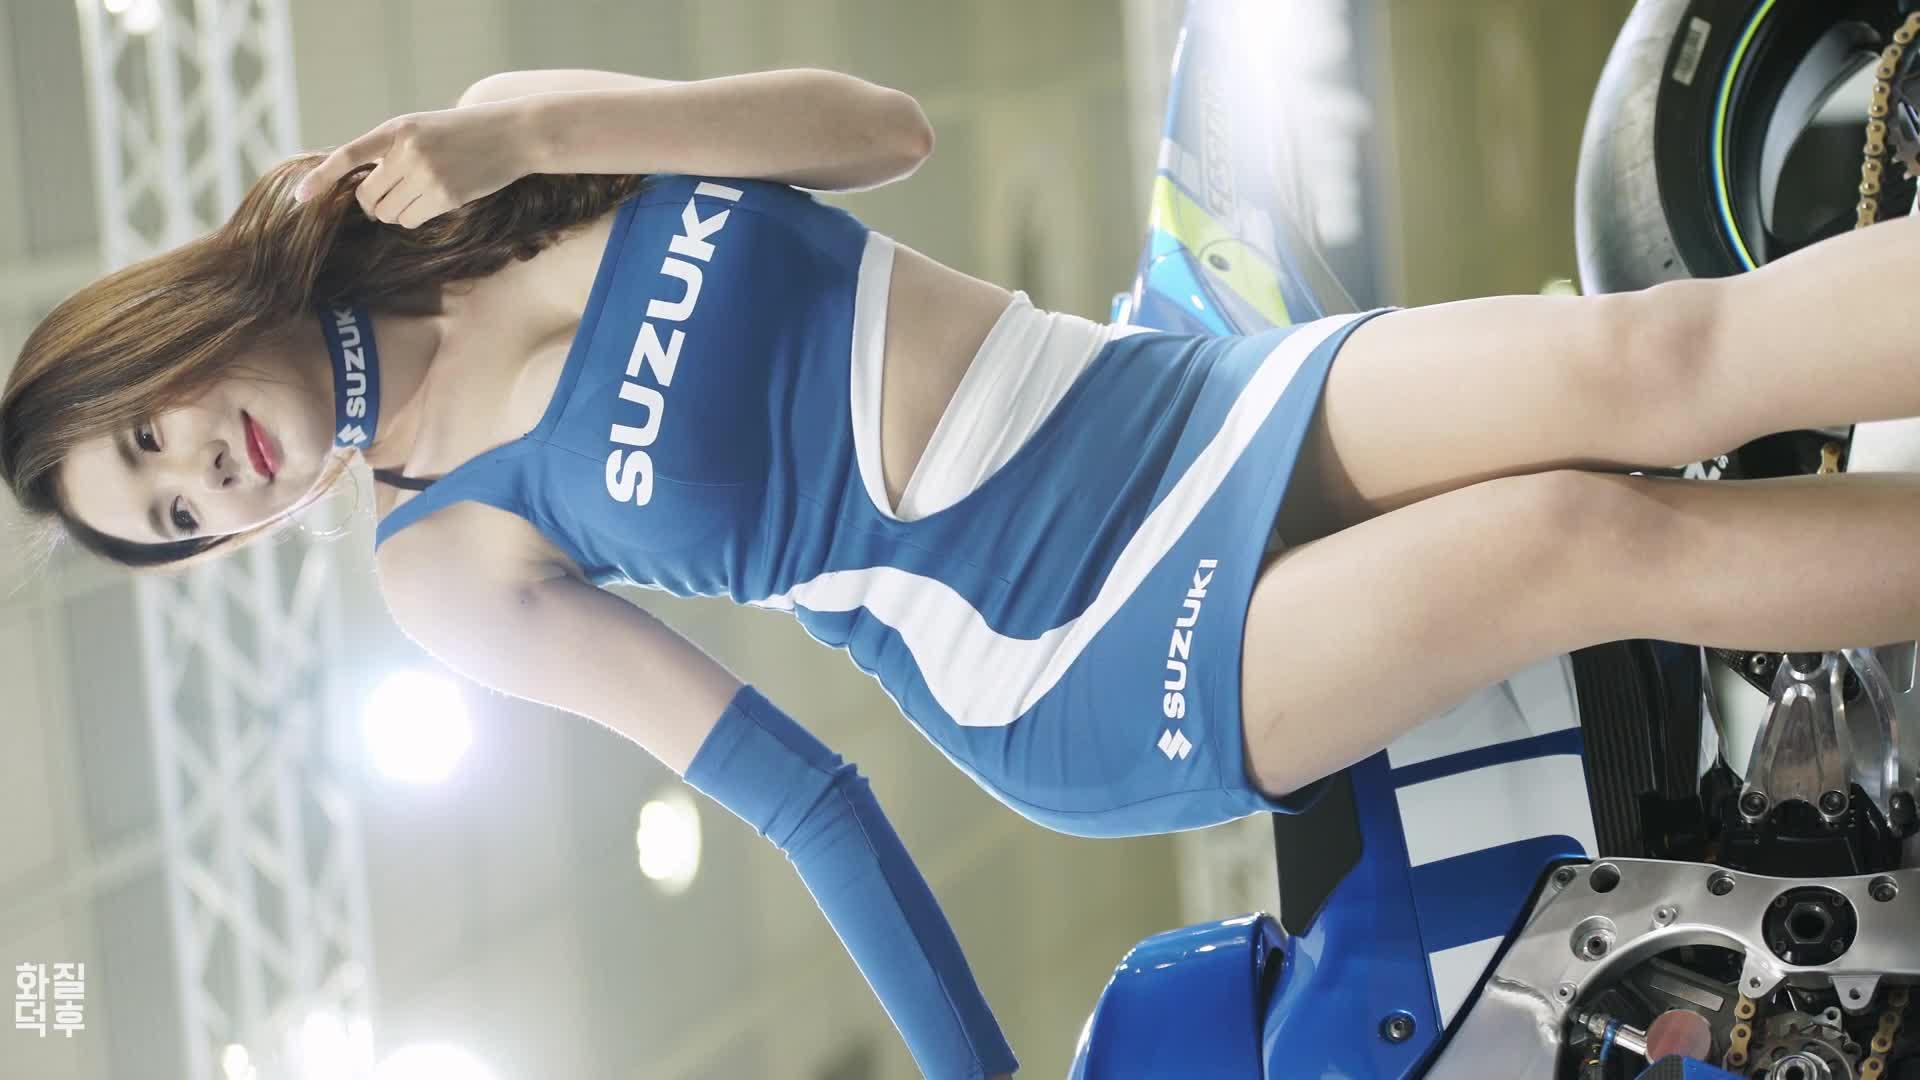 4K 민유린 Min Yurin #12 Horizontal Fancam 2018 모터사이클쇼 by 화질덕후 4kOTAKU